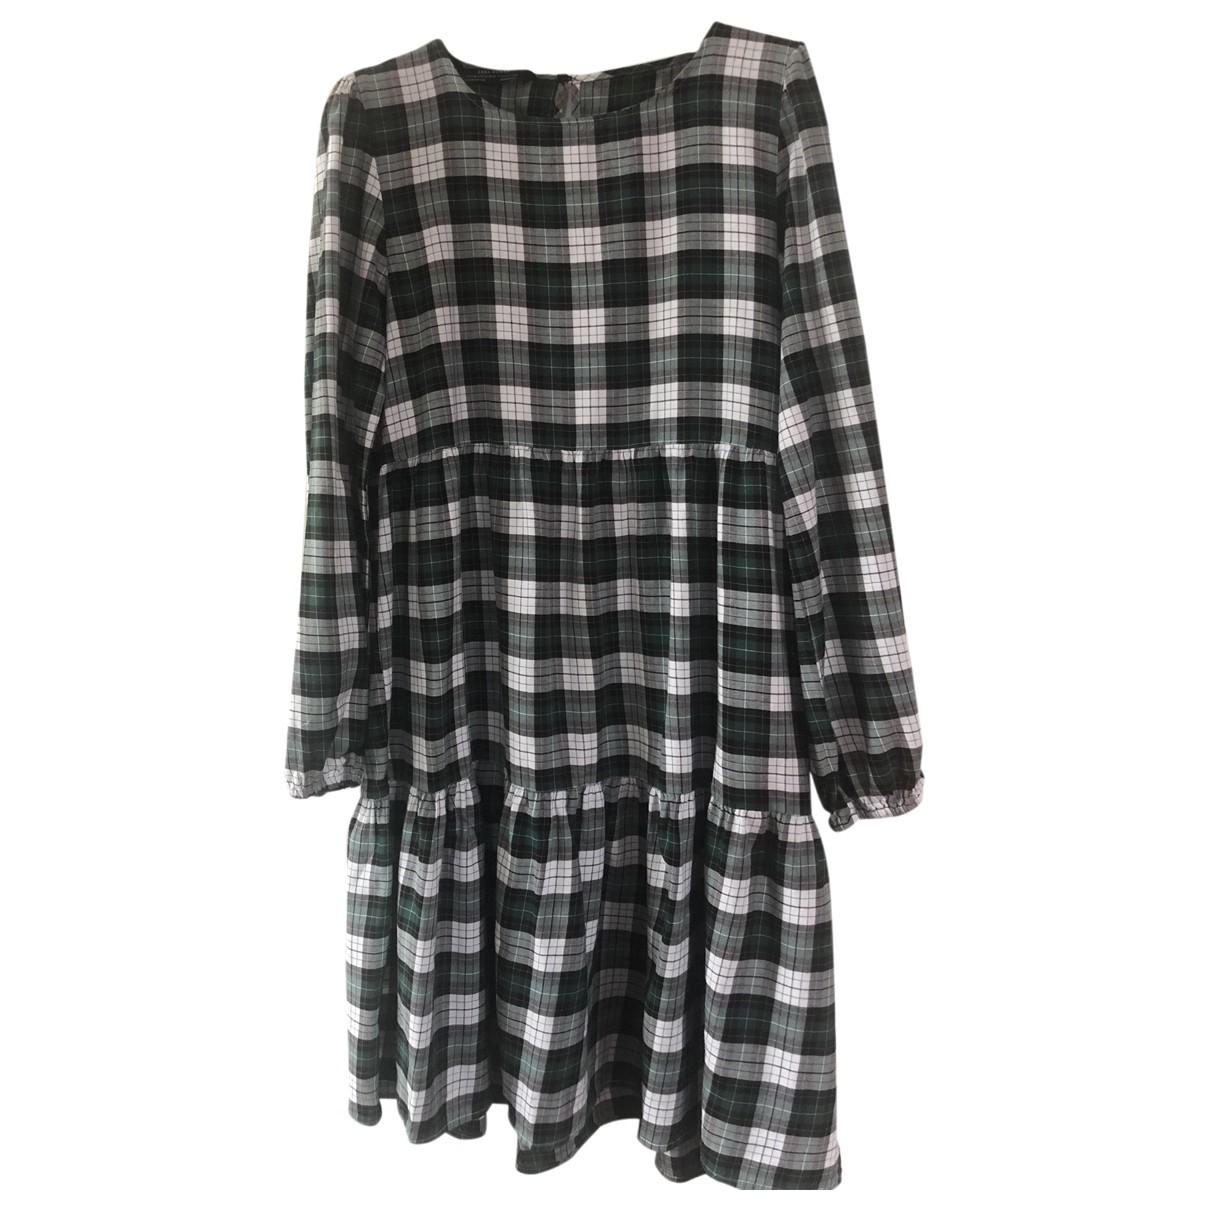 Zara - Robe   pour femme en coton - multicolore